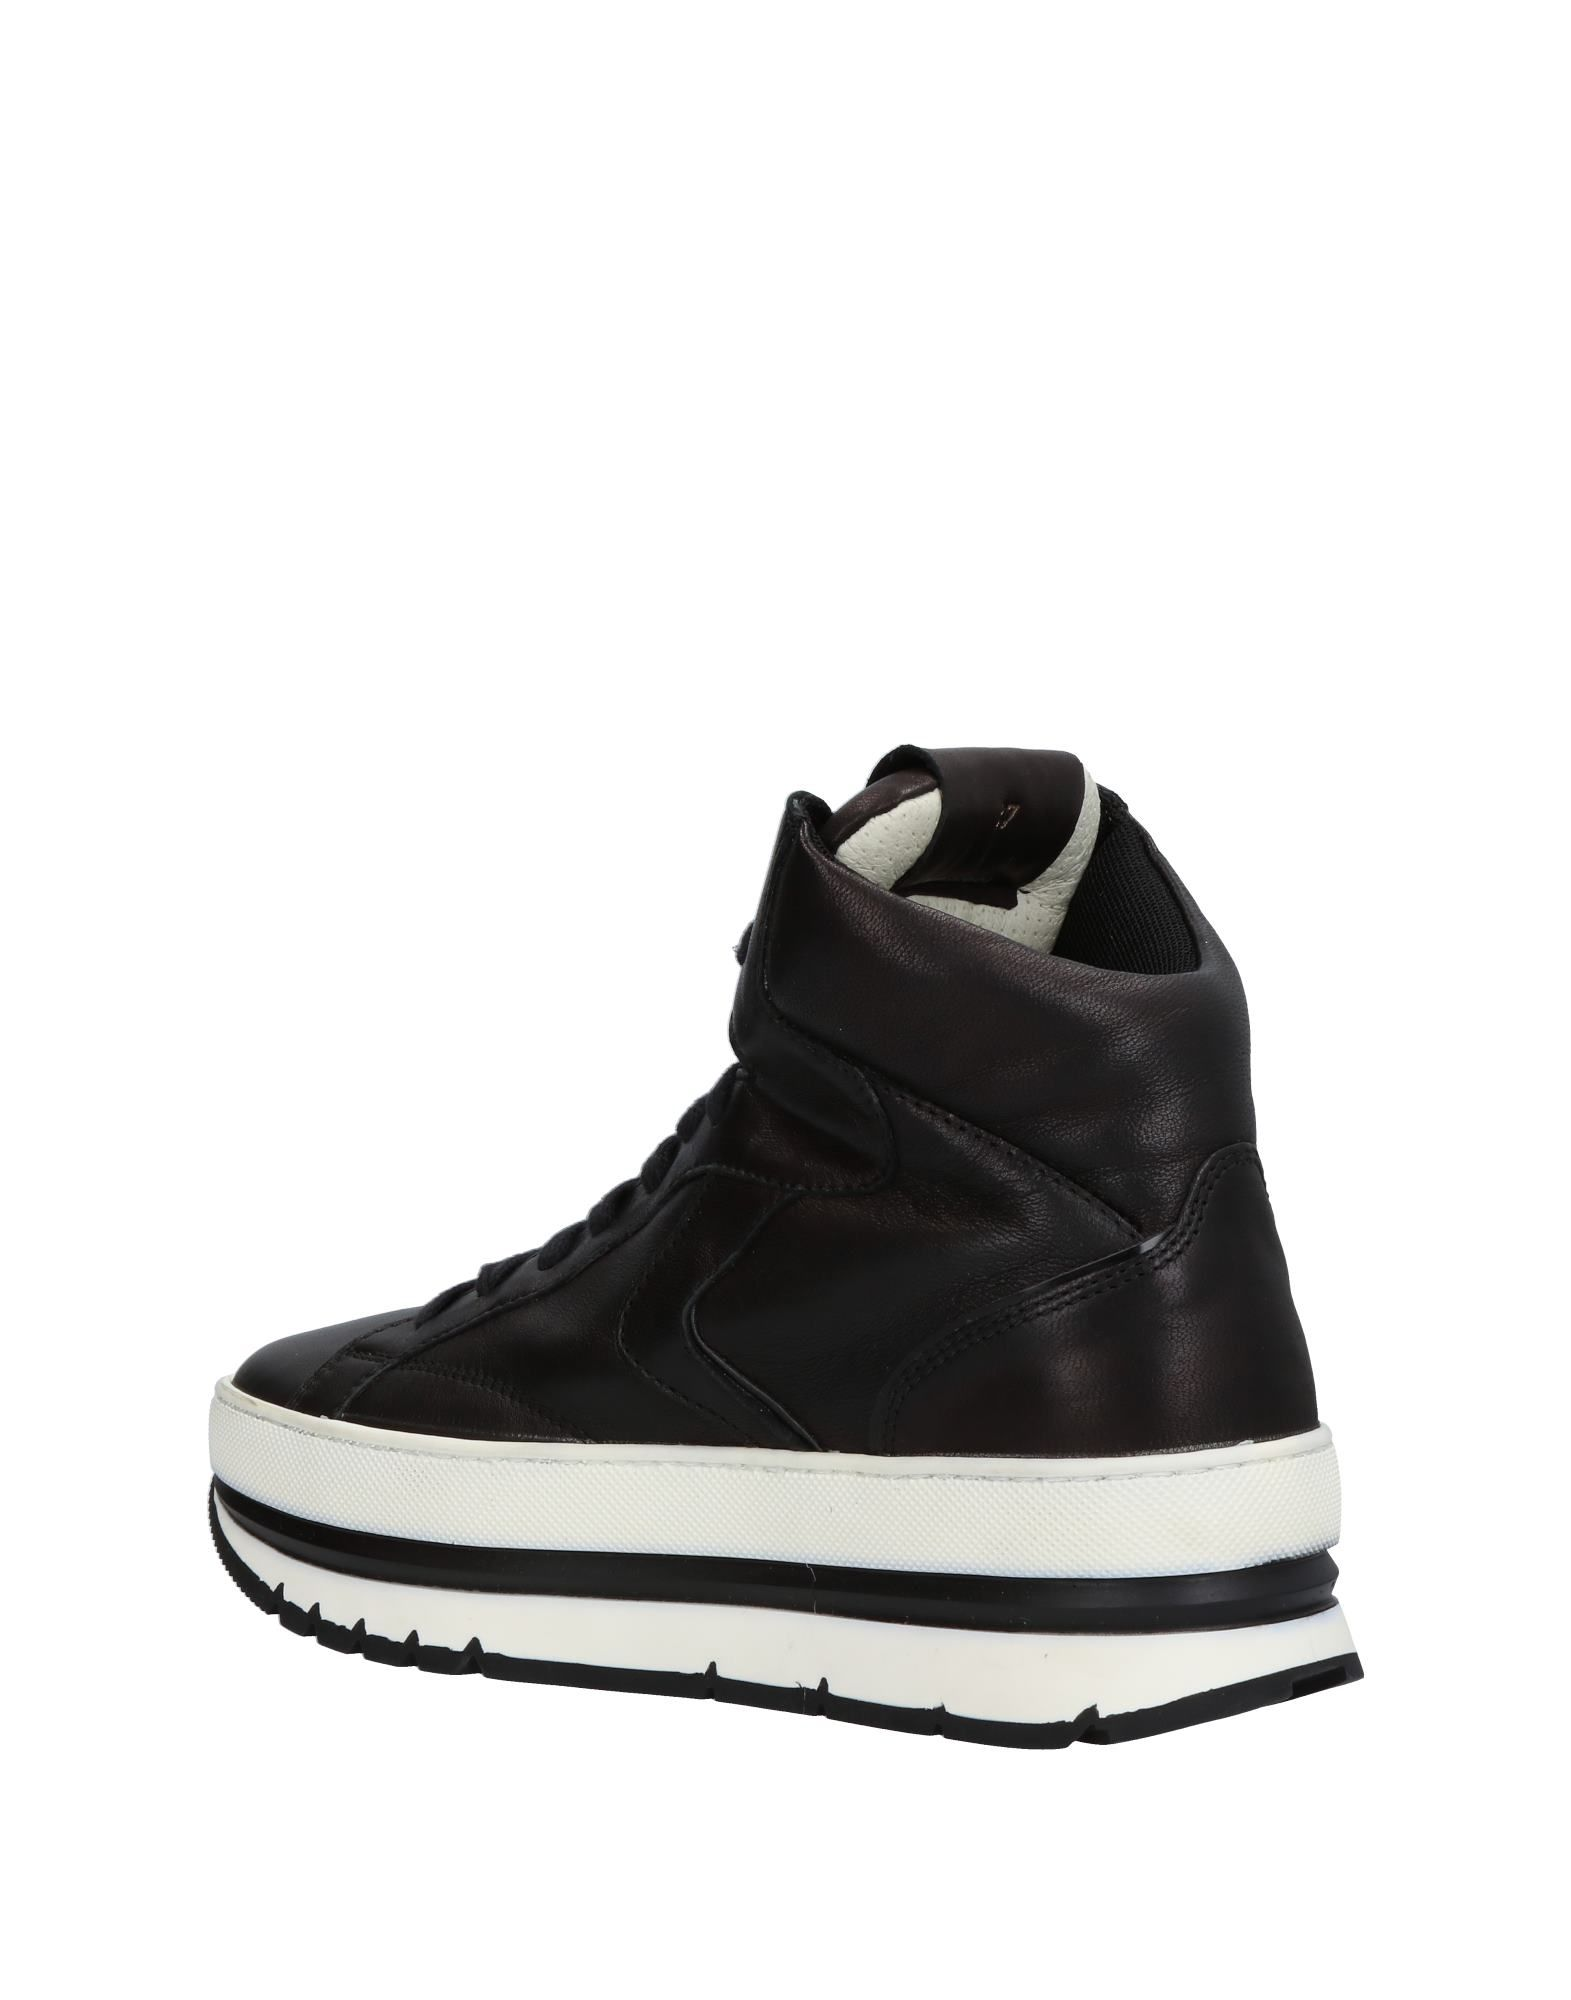 Voile 11337900VJ Blanche Sneakers Damen  11337900VJ Voile Gute Qualität beliebte Schuhe ec9d81